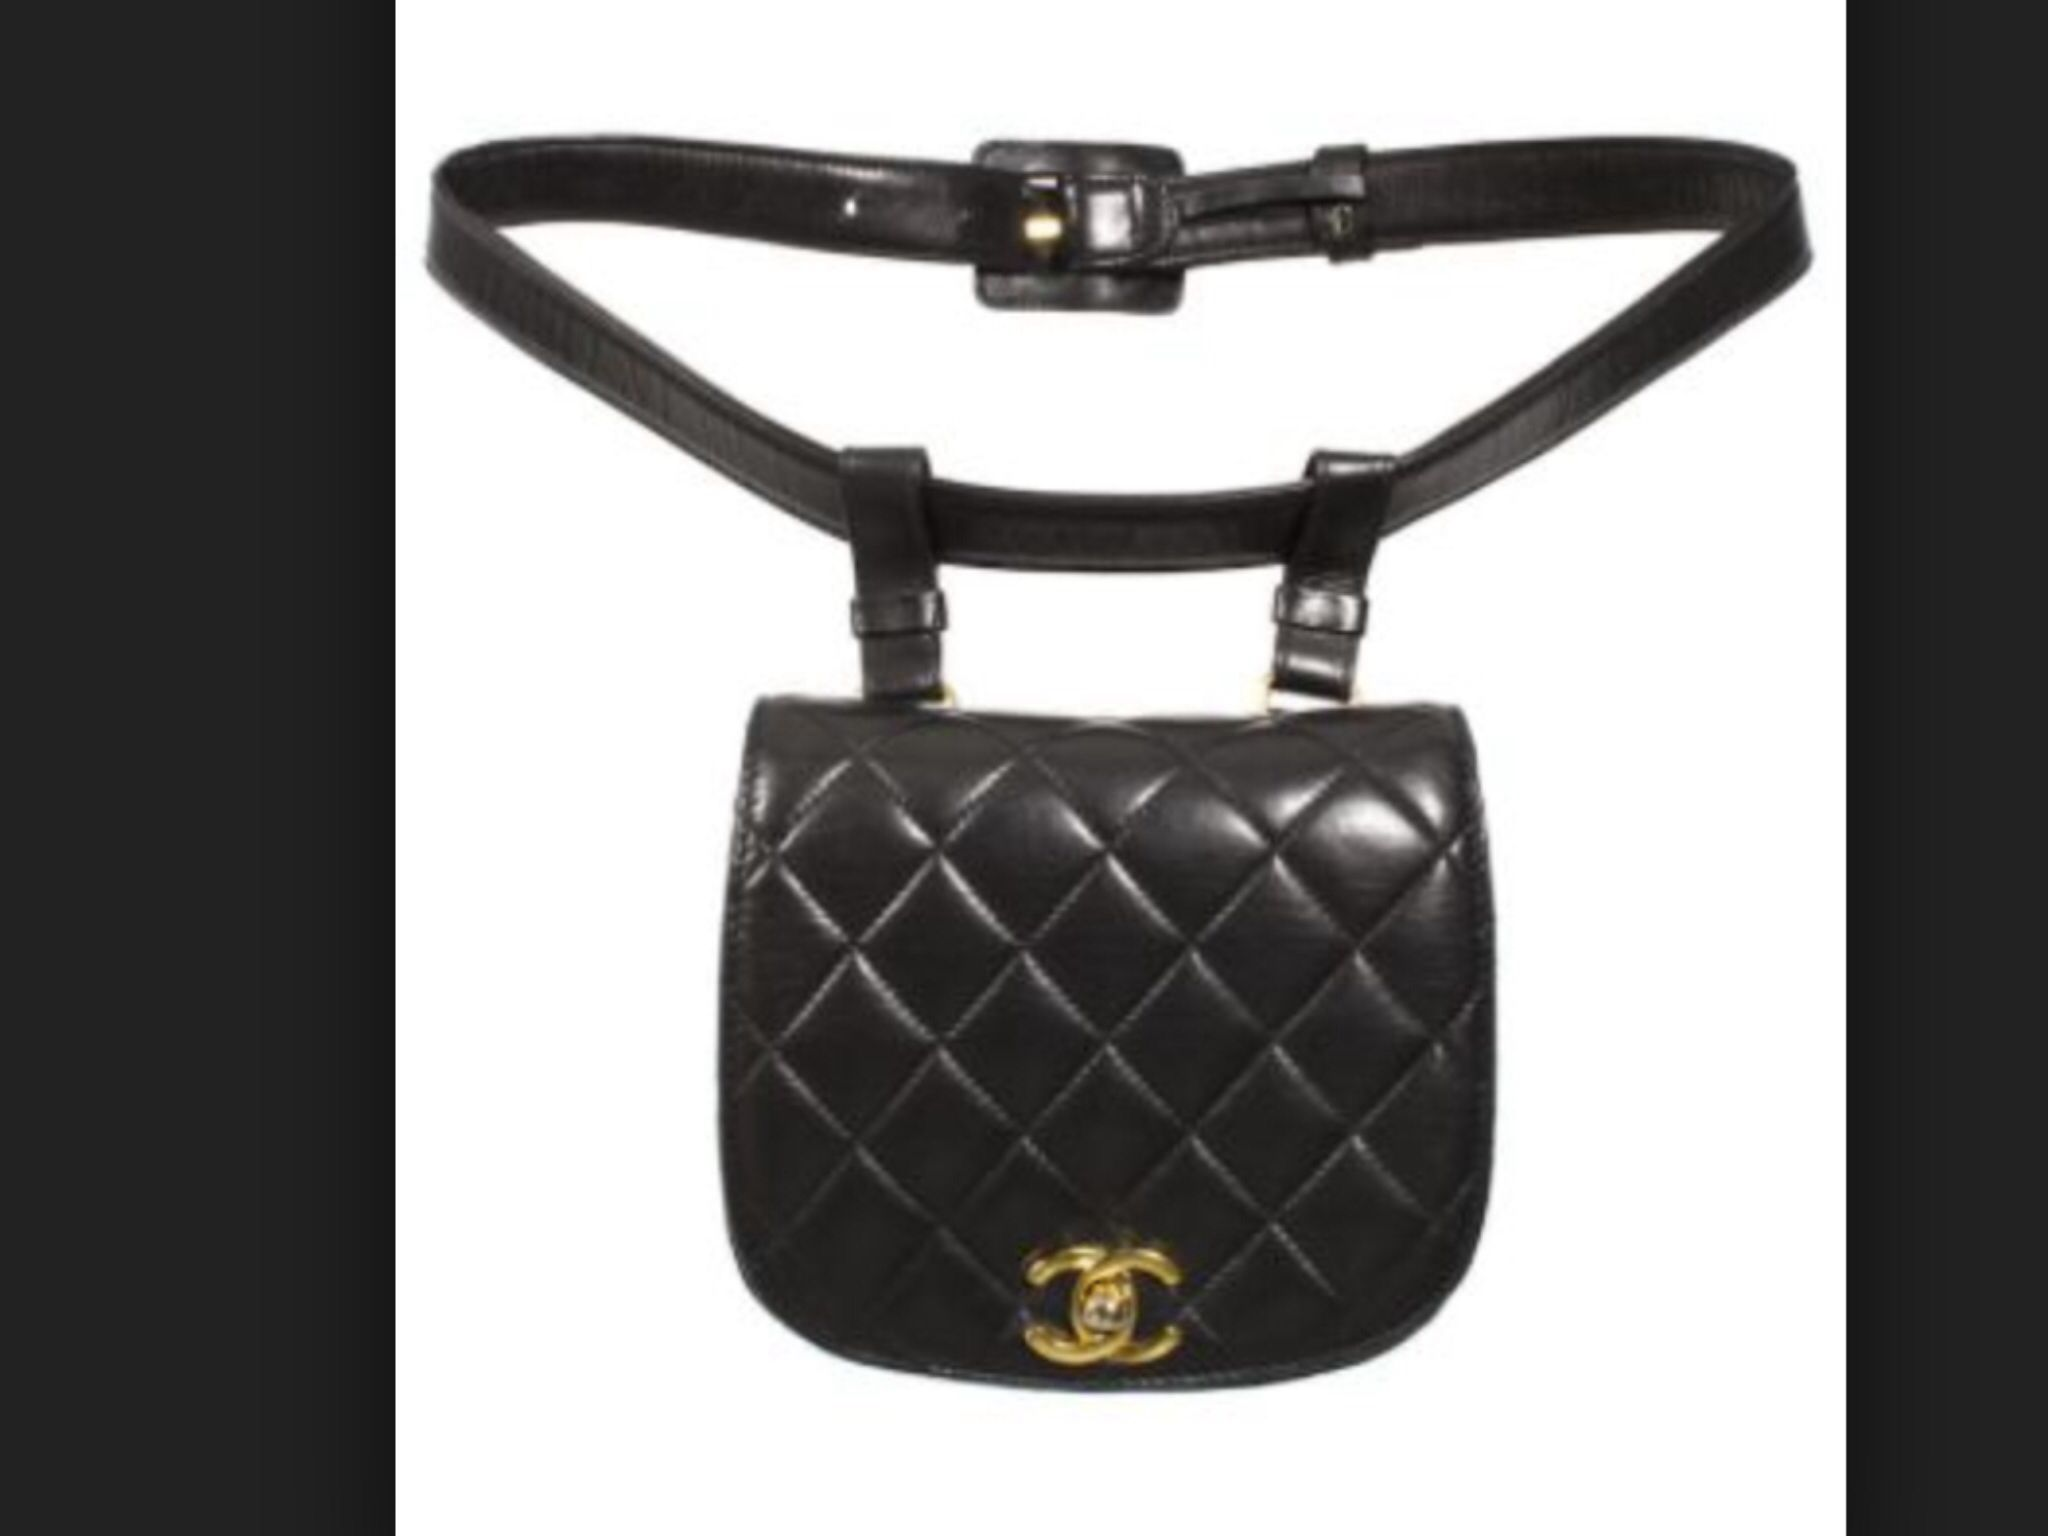 f8941fc6c64d Chanel fanny pack